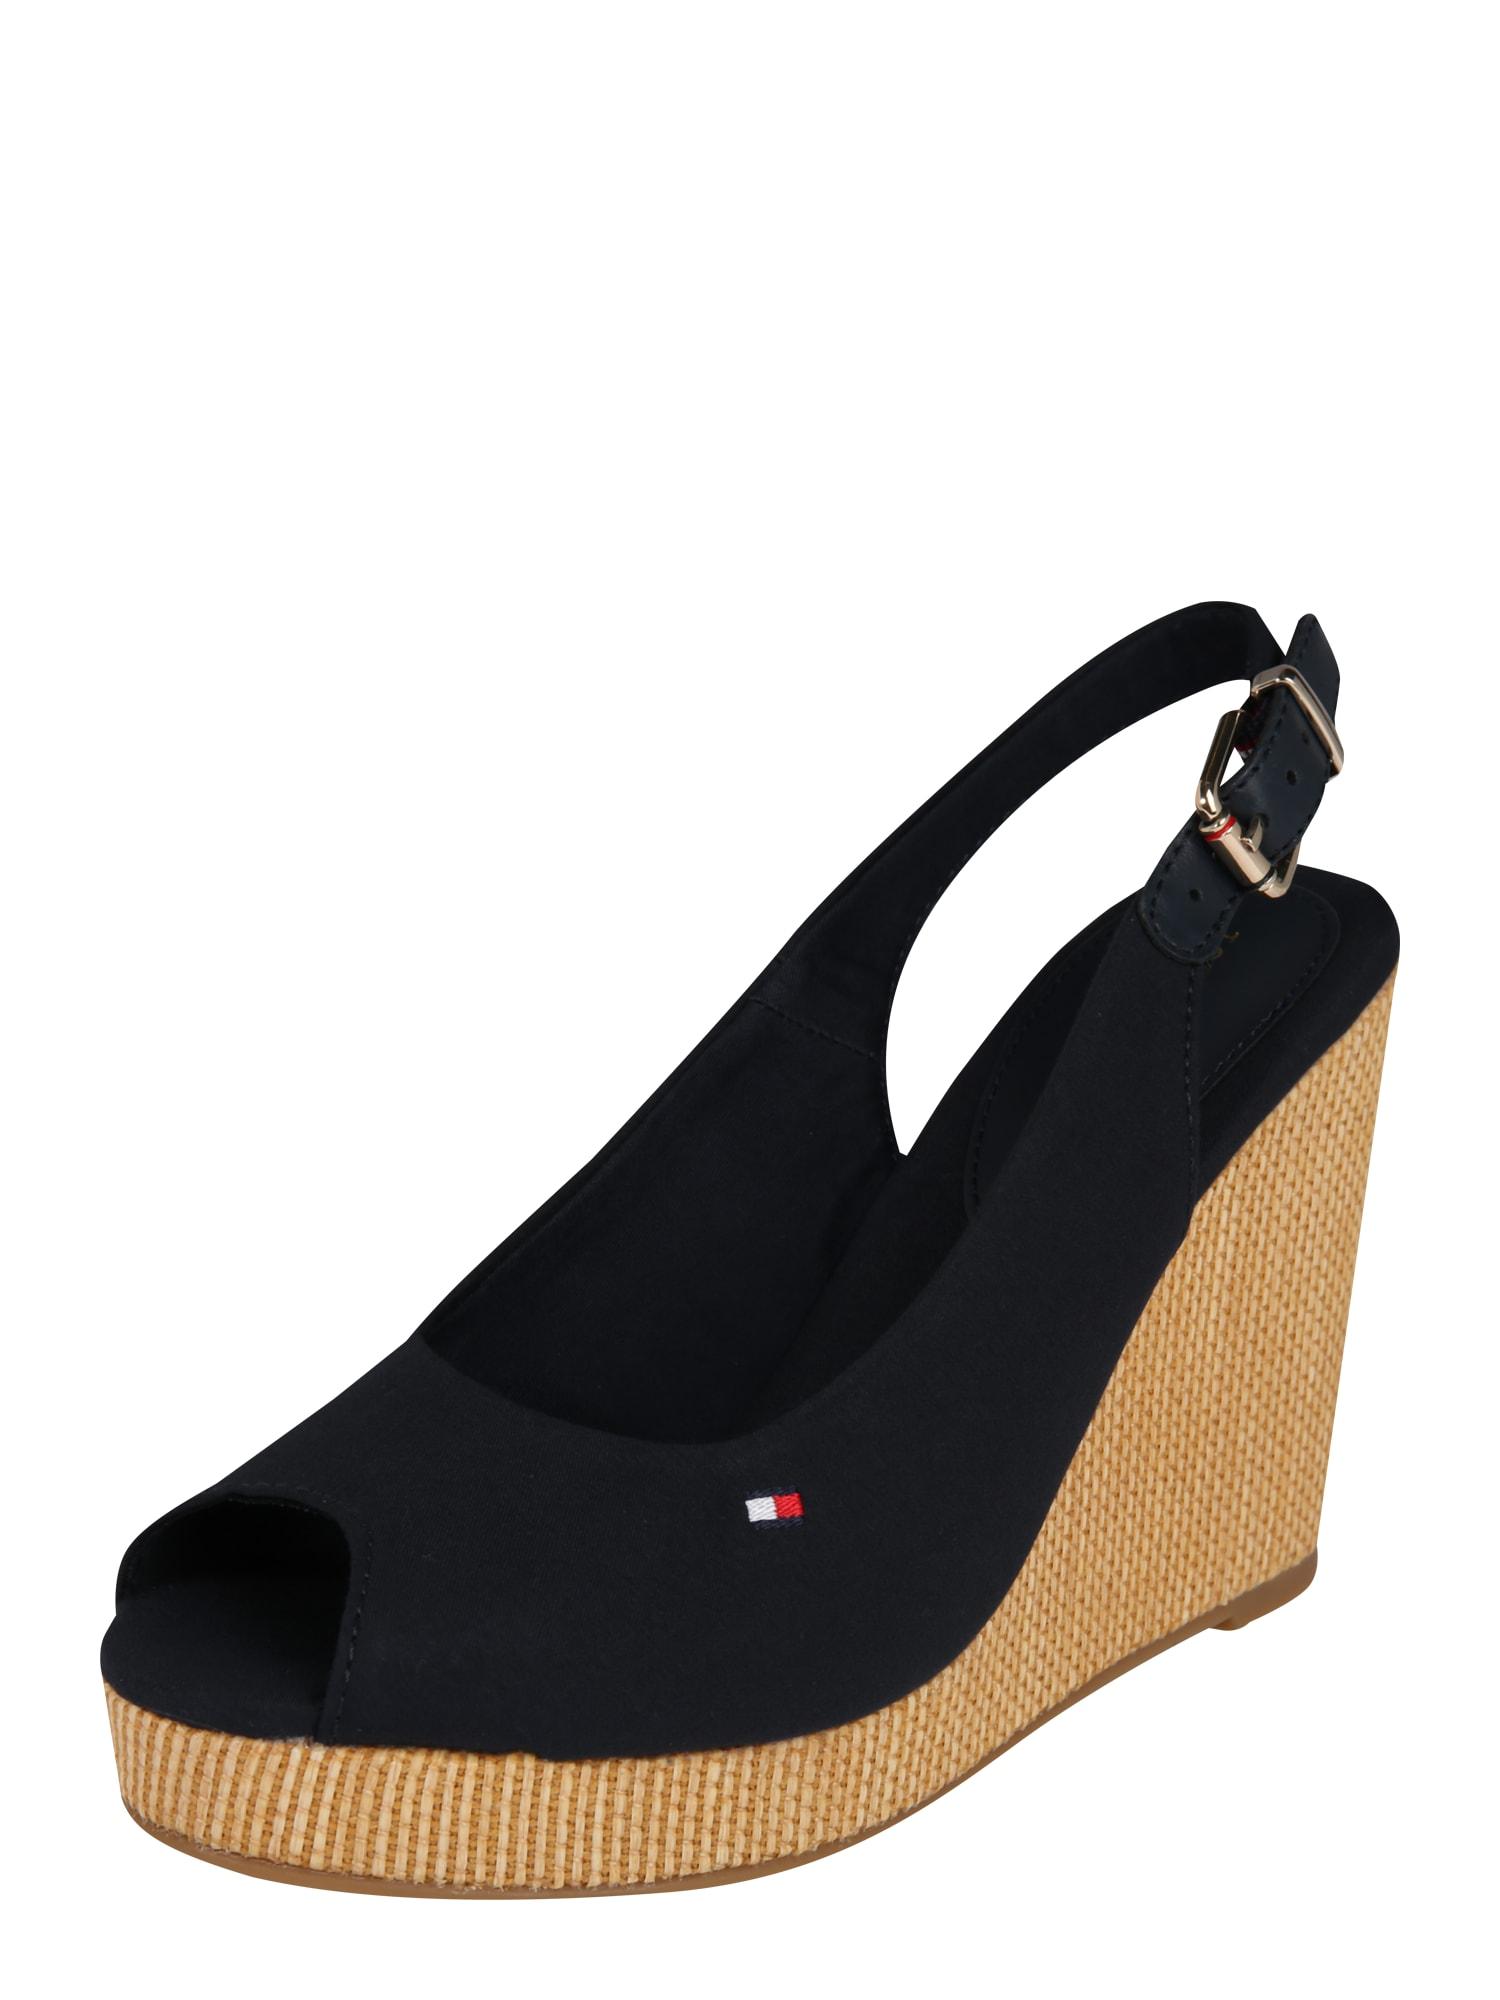 TOMMY HILFIGER Remienkové sandále 'ELENA 57D3'  béžová / tmavomodrá